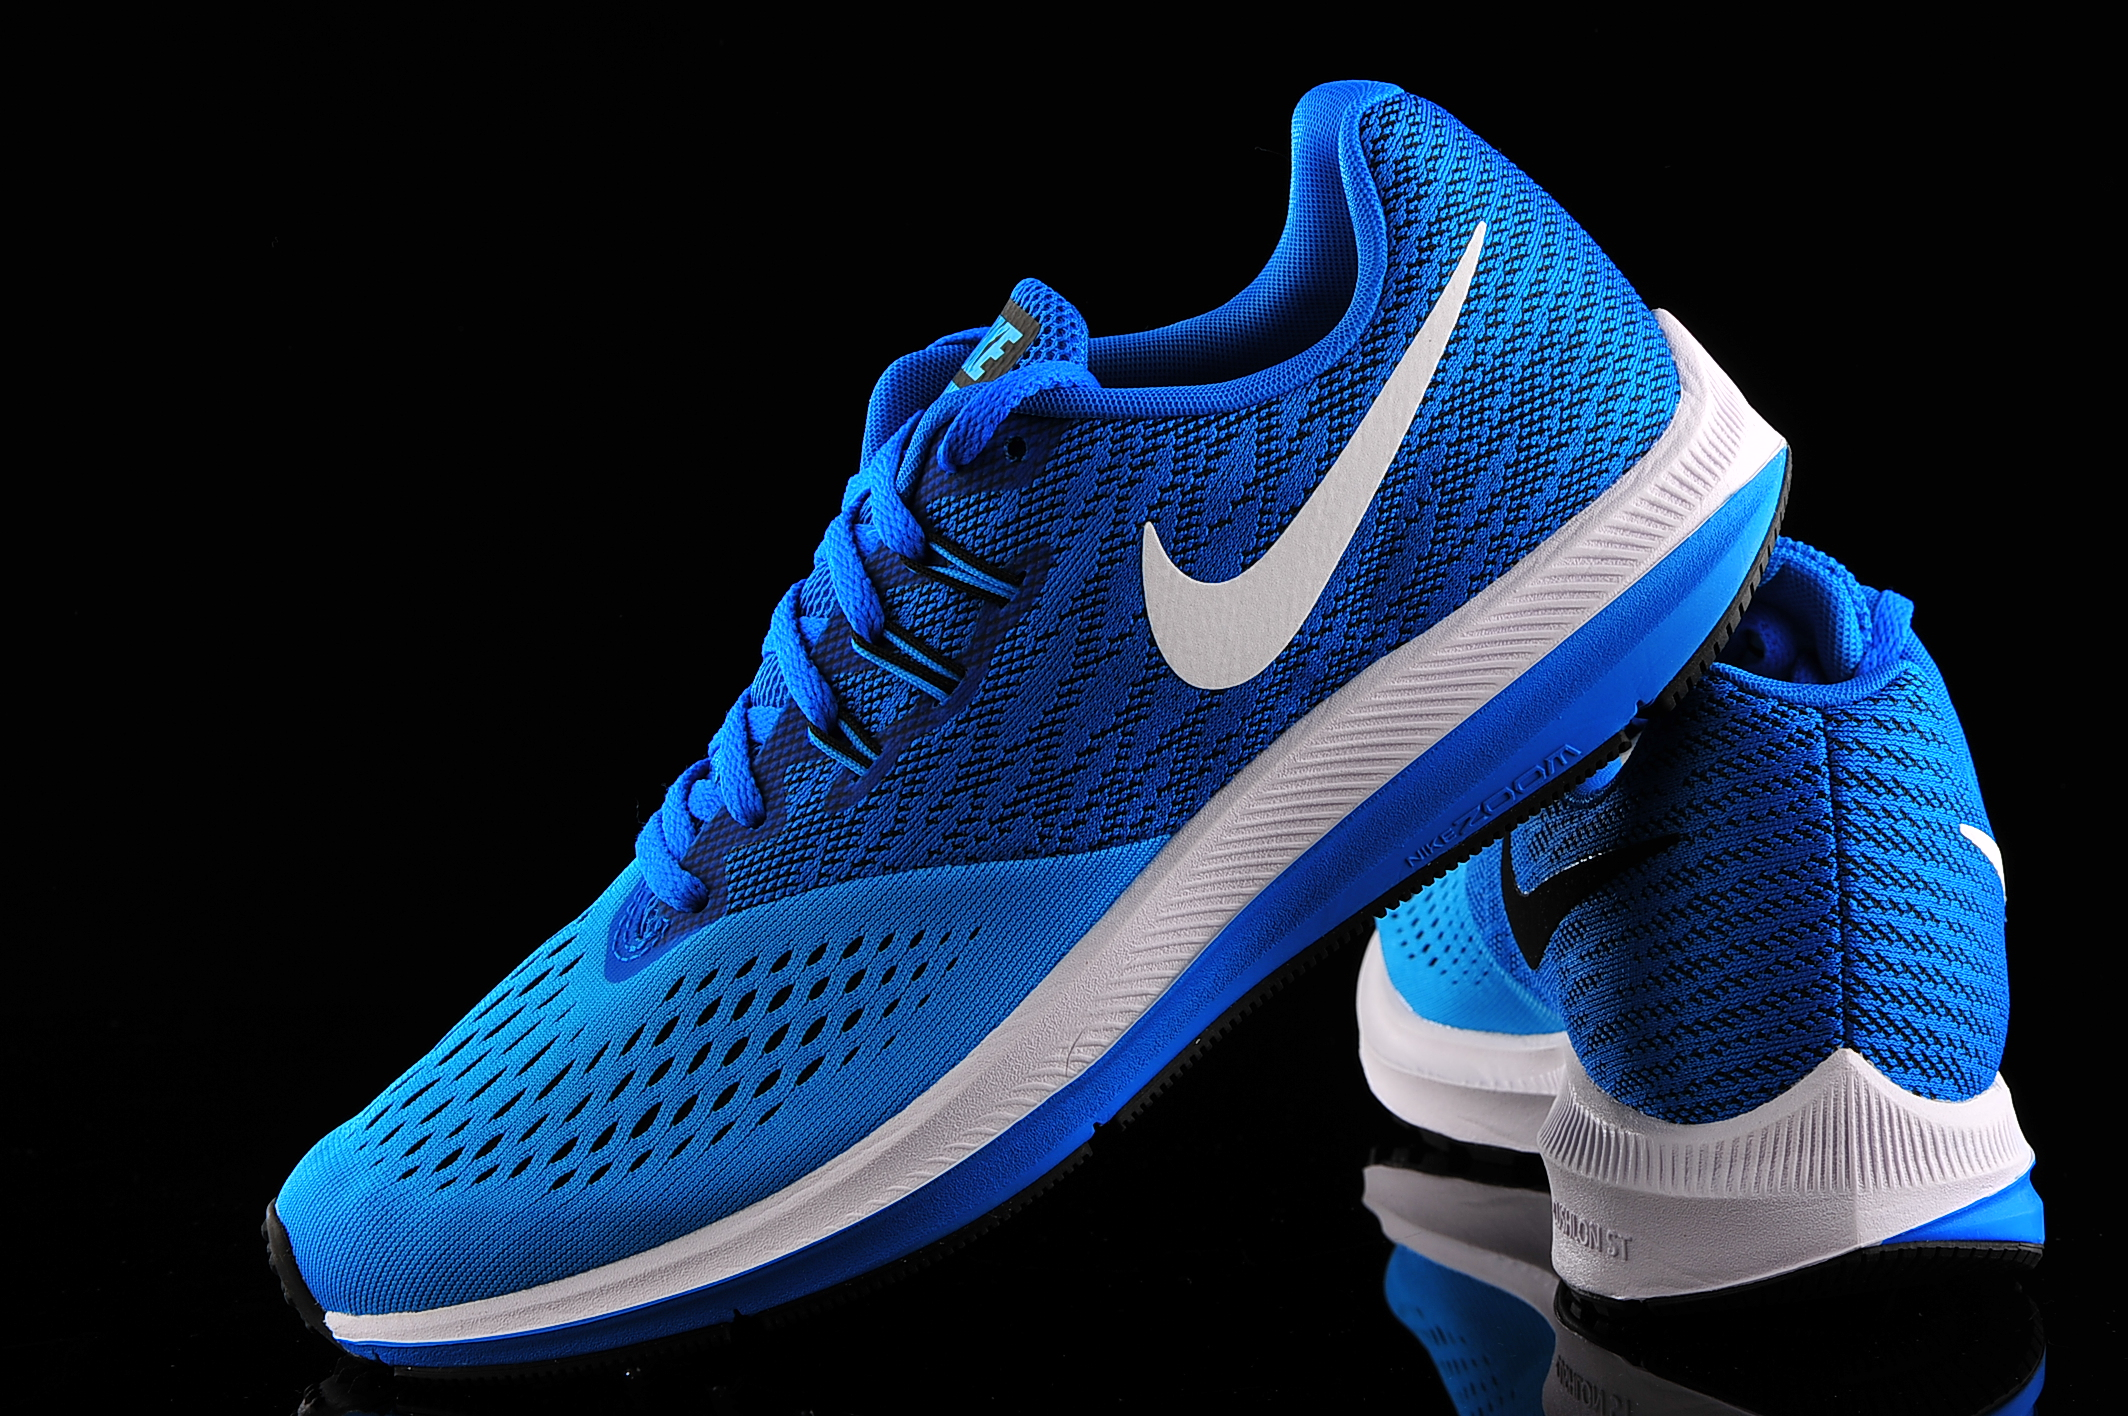 Nike Zoom Winflo 4 898466-401 | R-GOL